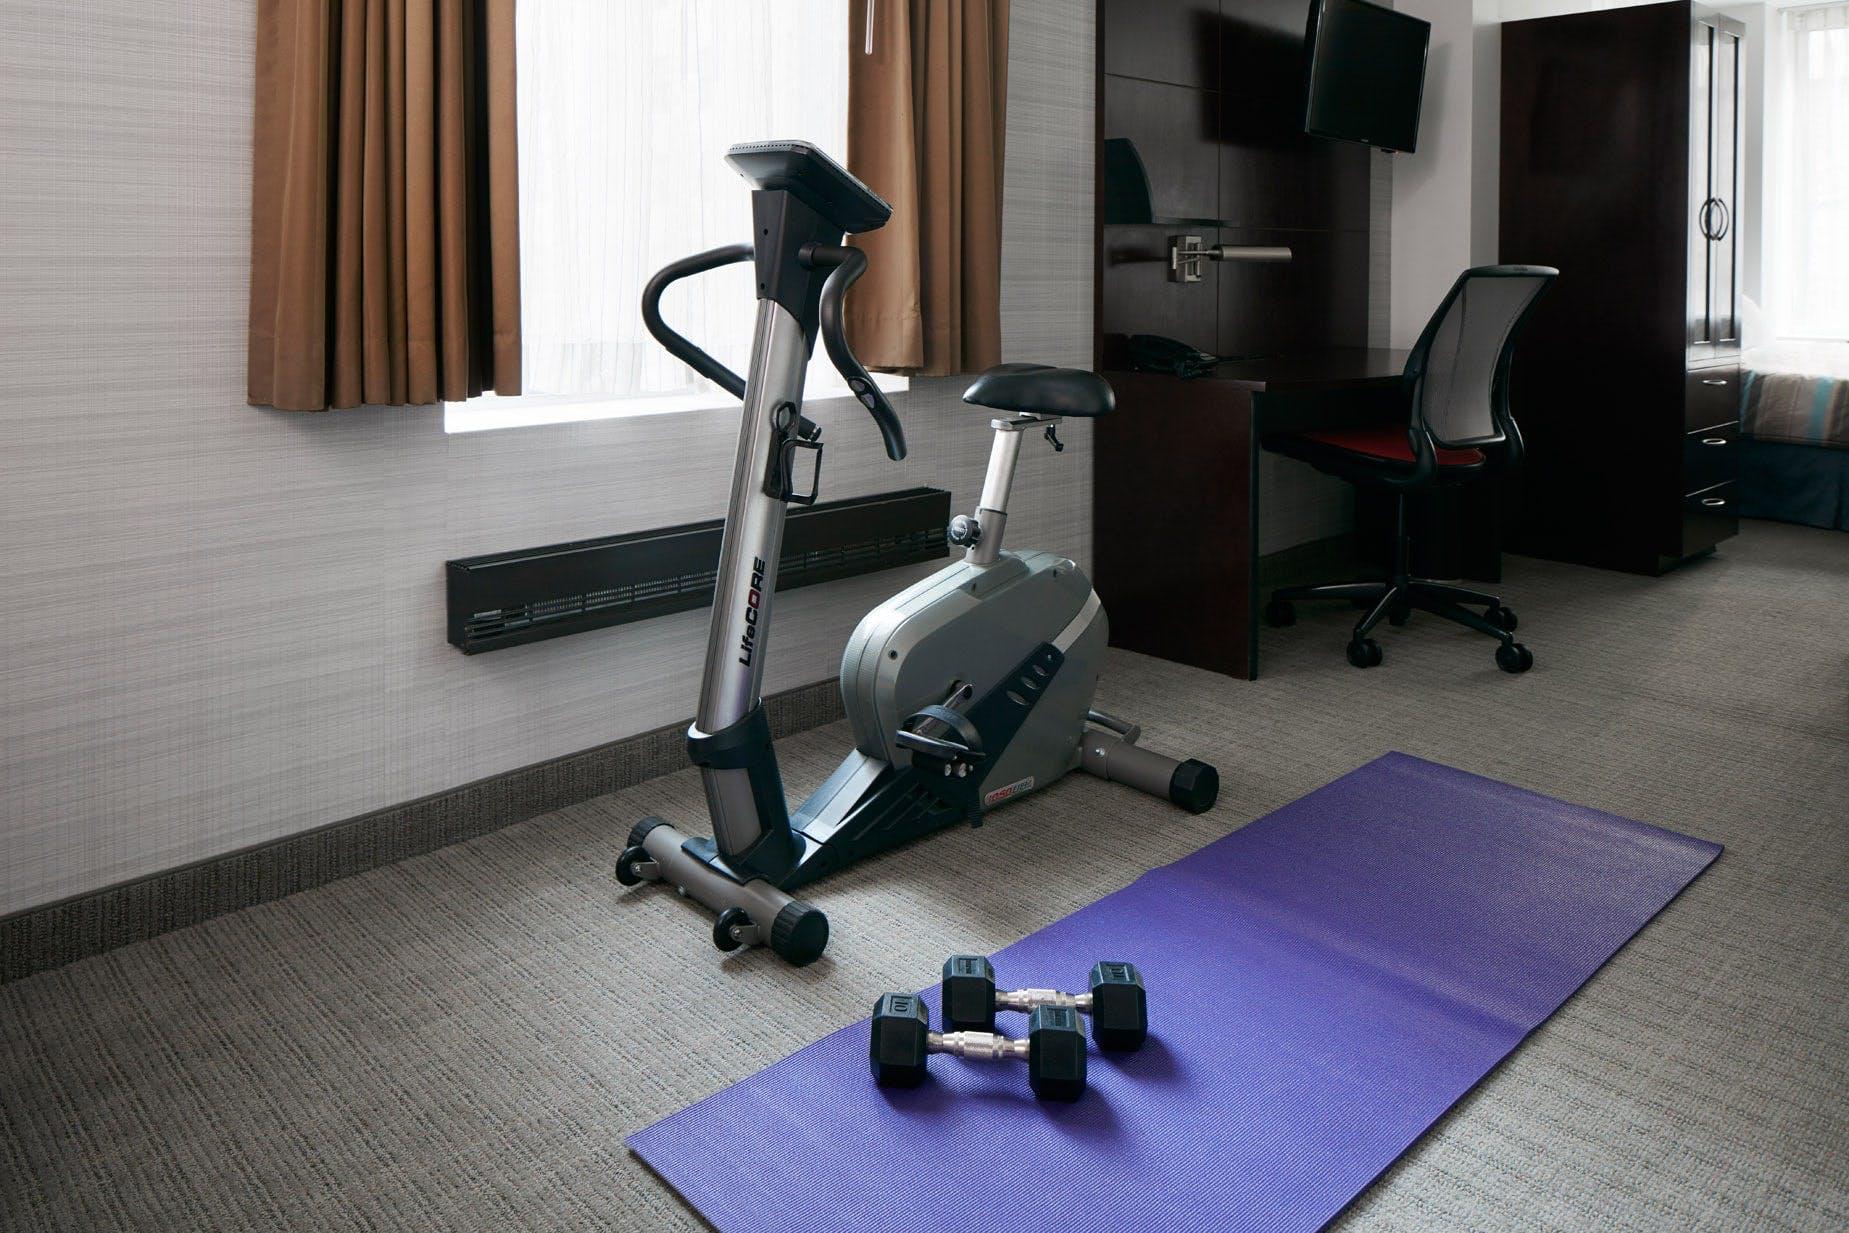 In Room Exercise Equipment at Club Quarters Hotel, opposite Rockefeller Center